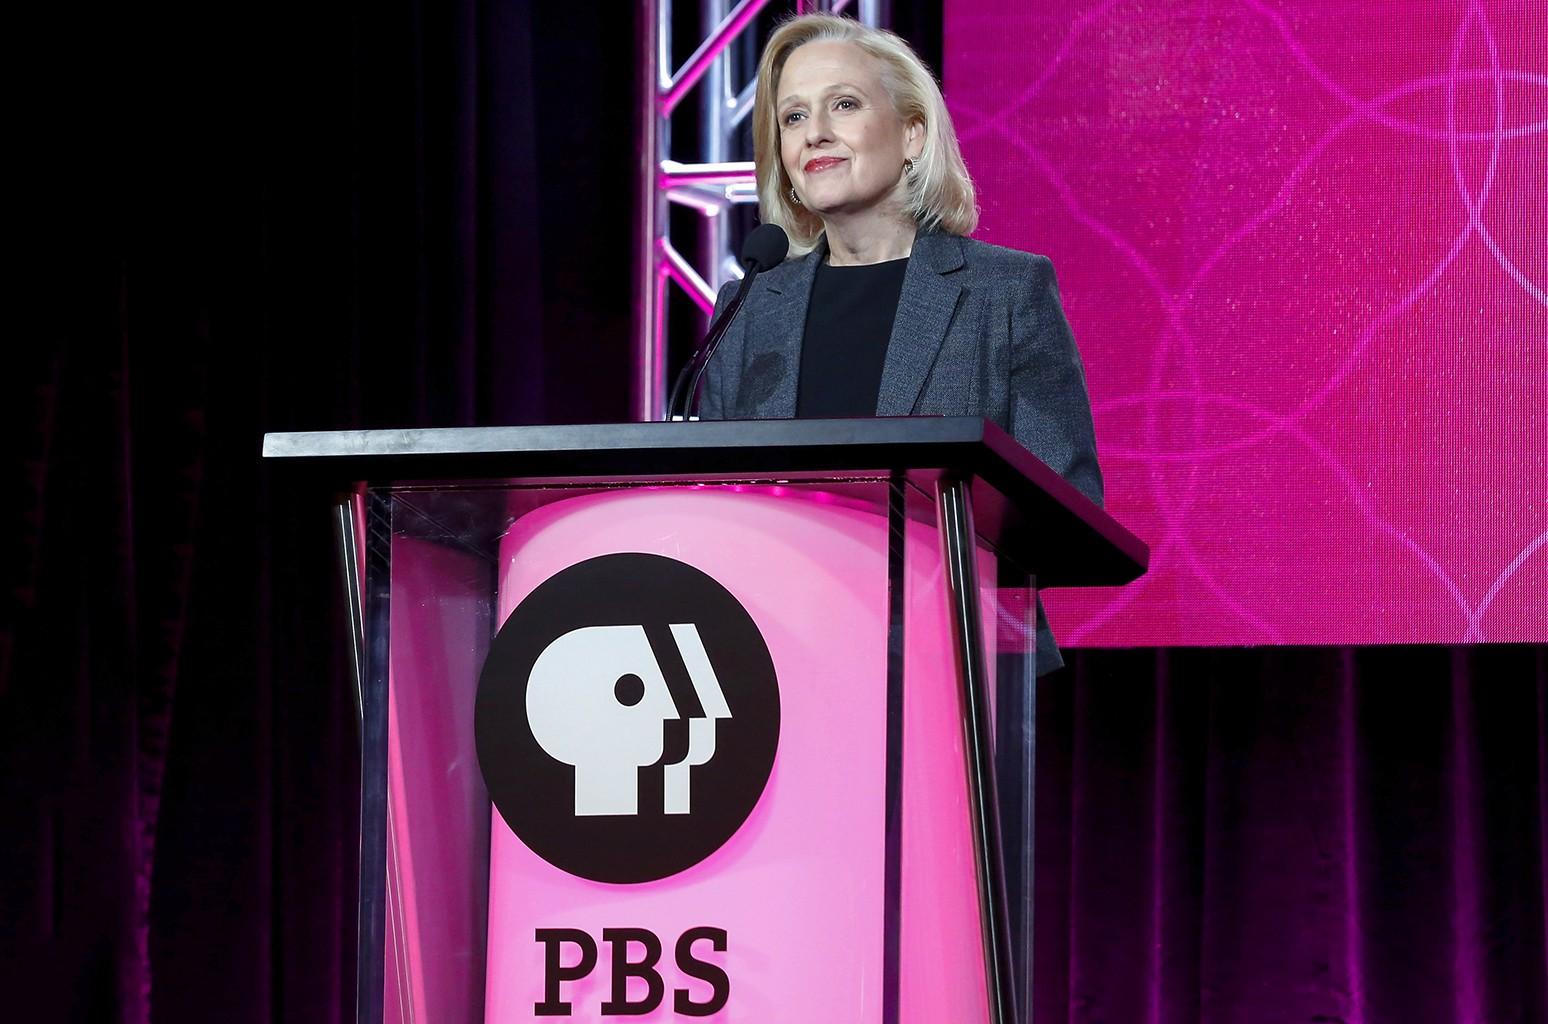 PBS President and CEO Paula Kerge